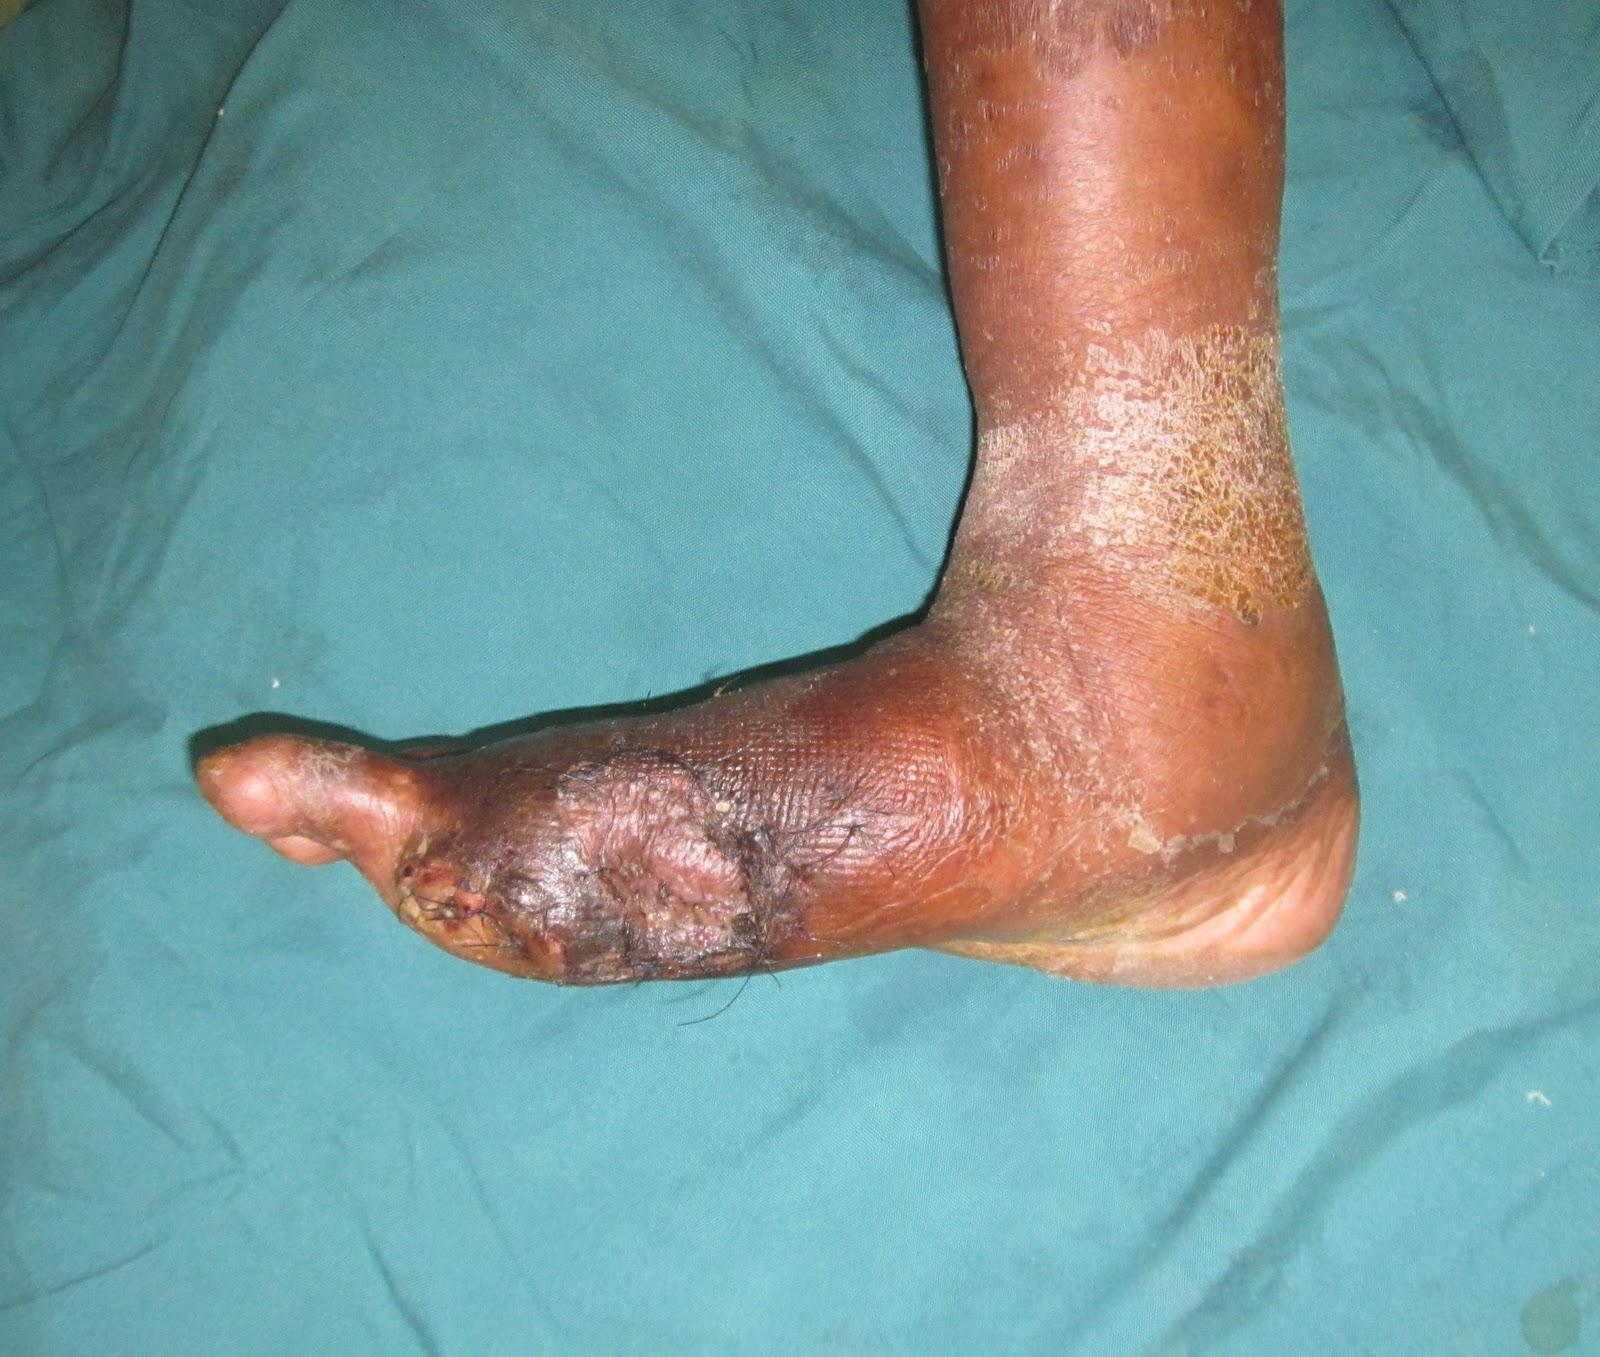 Wet Gangrene - RightDiagnosis.com